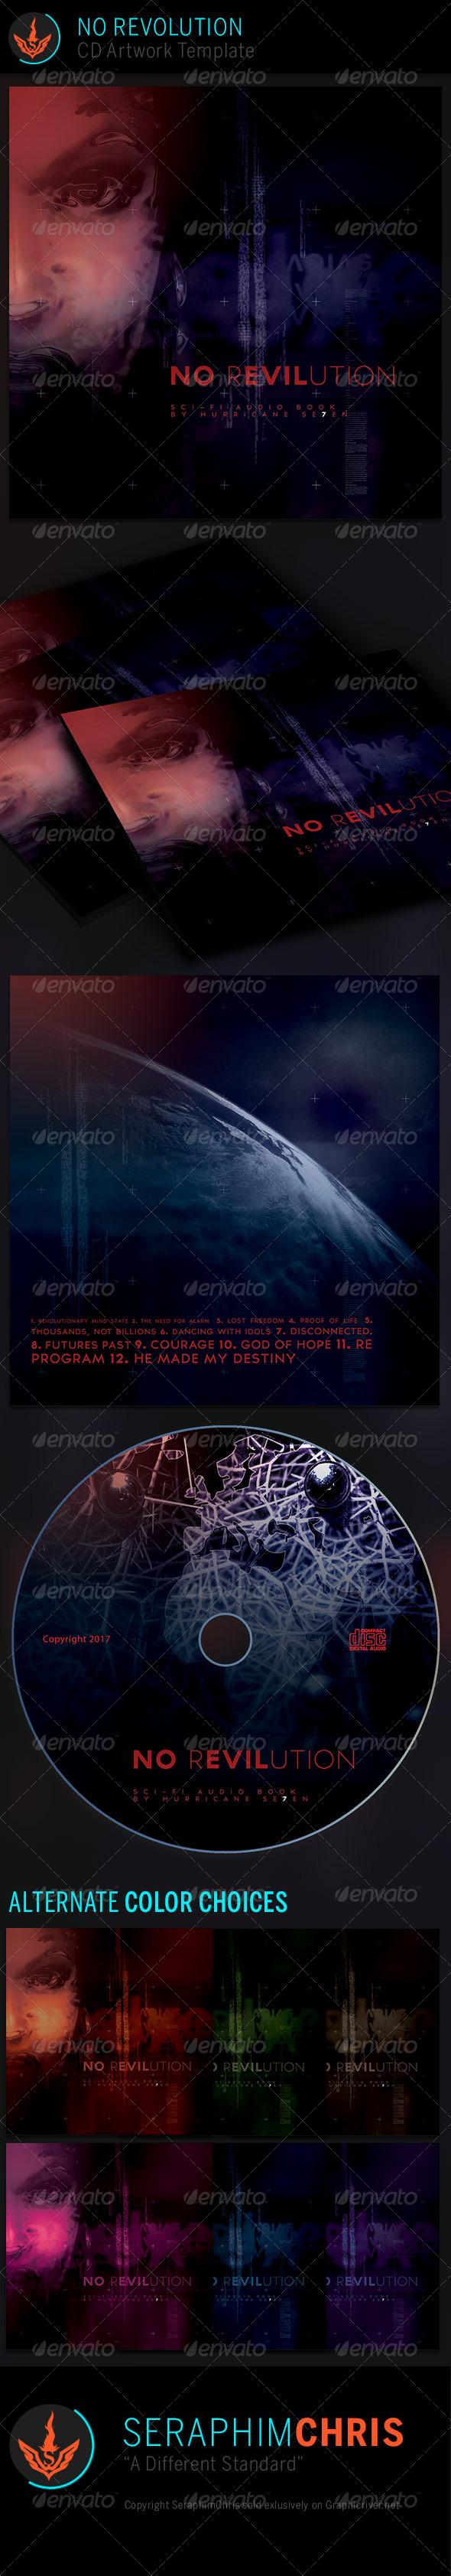 No Revolution: CD Artwork Template - CD & DVD Artwork Print Templates